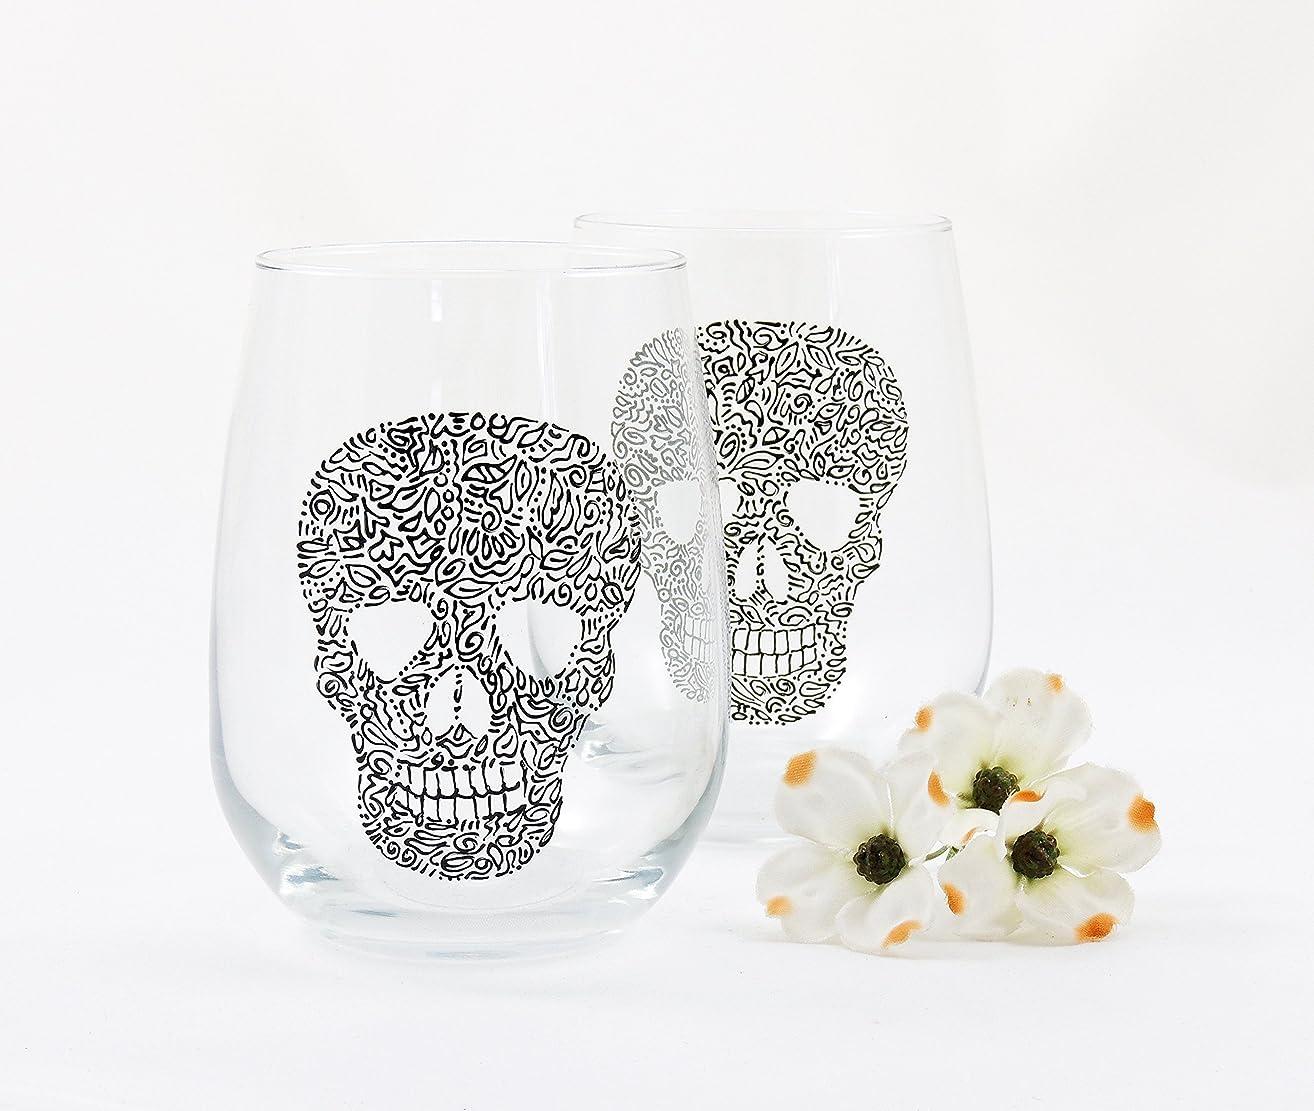 Cinco de Mayo stemless wine glasses - Hand painted - Set of 2 - Sugar Skull - Halloween